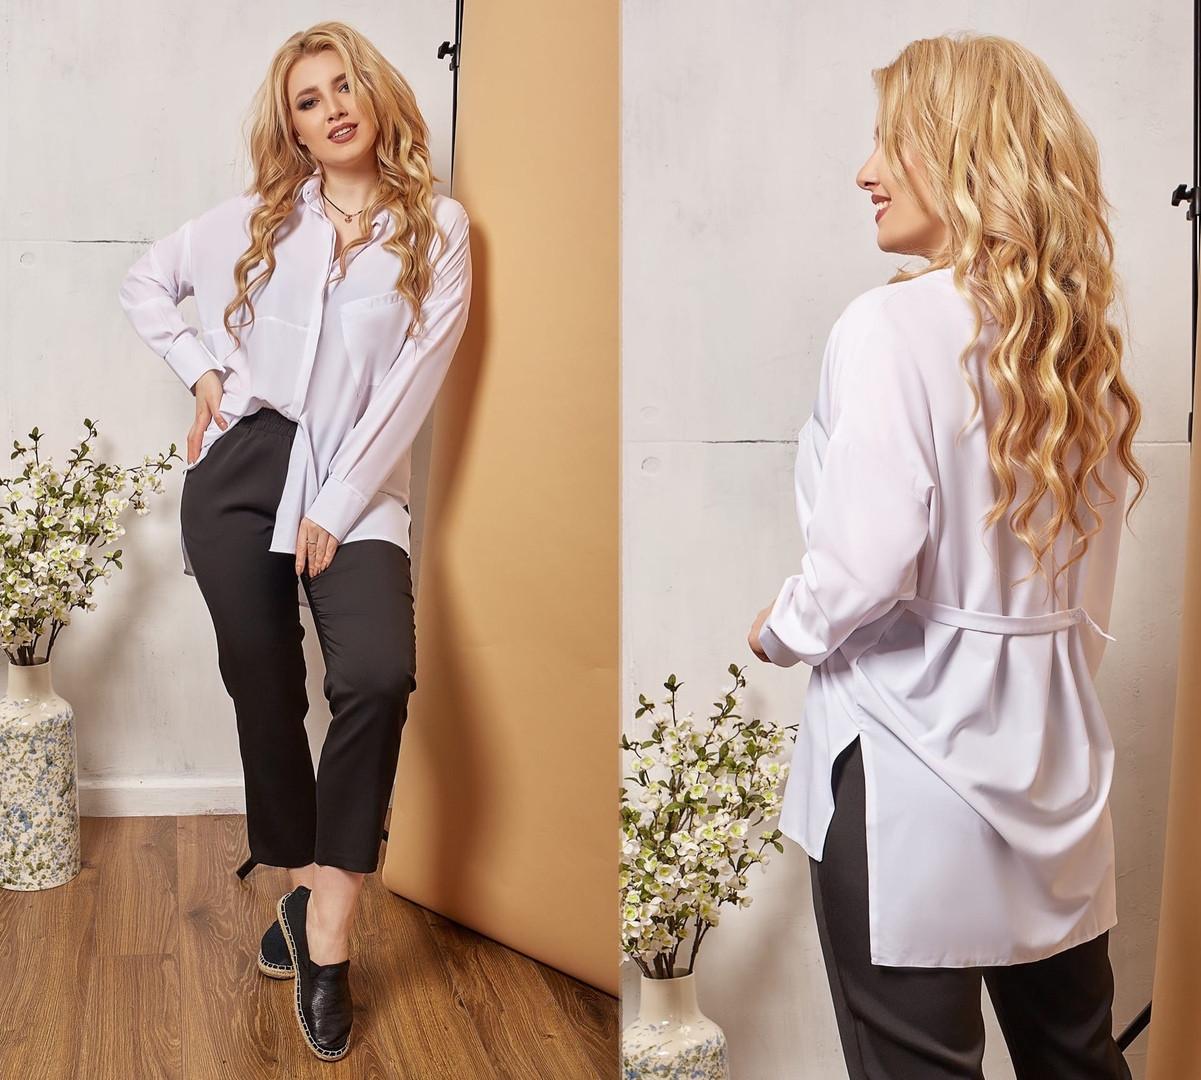 Женский классический костюм двойка рубашка+брюки батал размеры:48-50,52-54,56-58,60-62